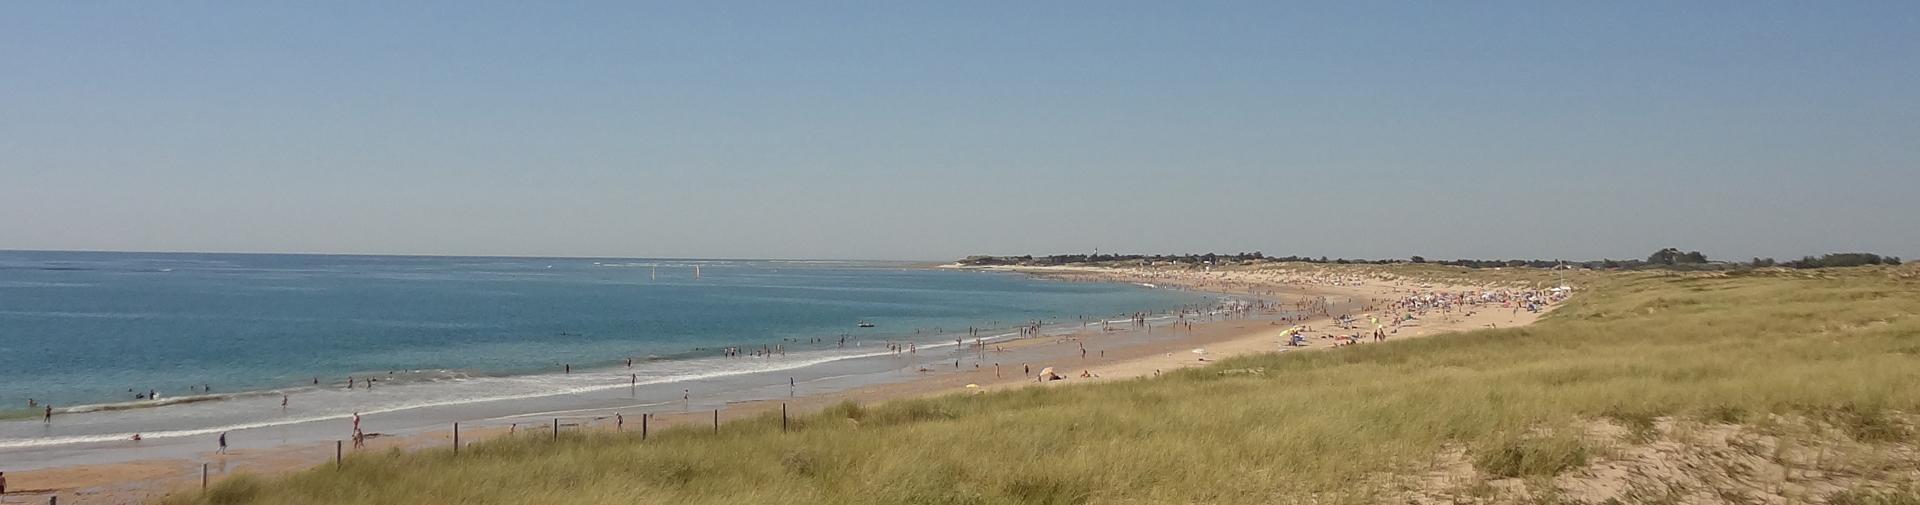 la-plage-a-400m-camping-ile-oleron-campiere